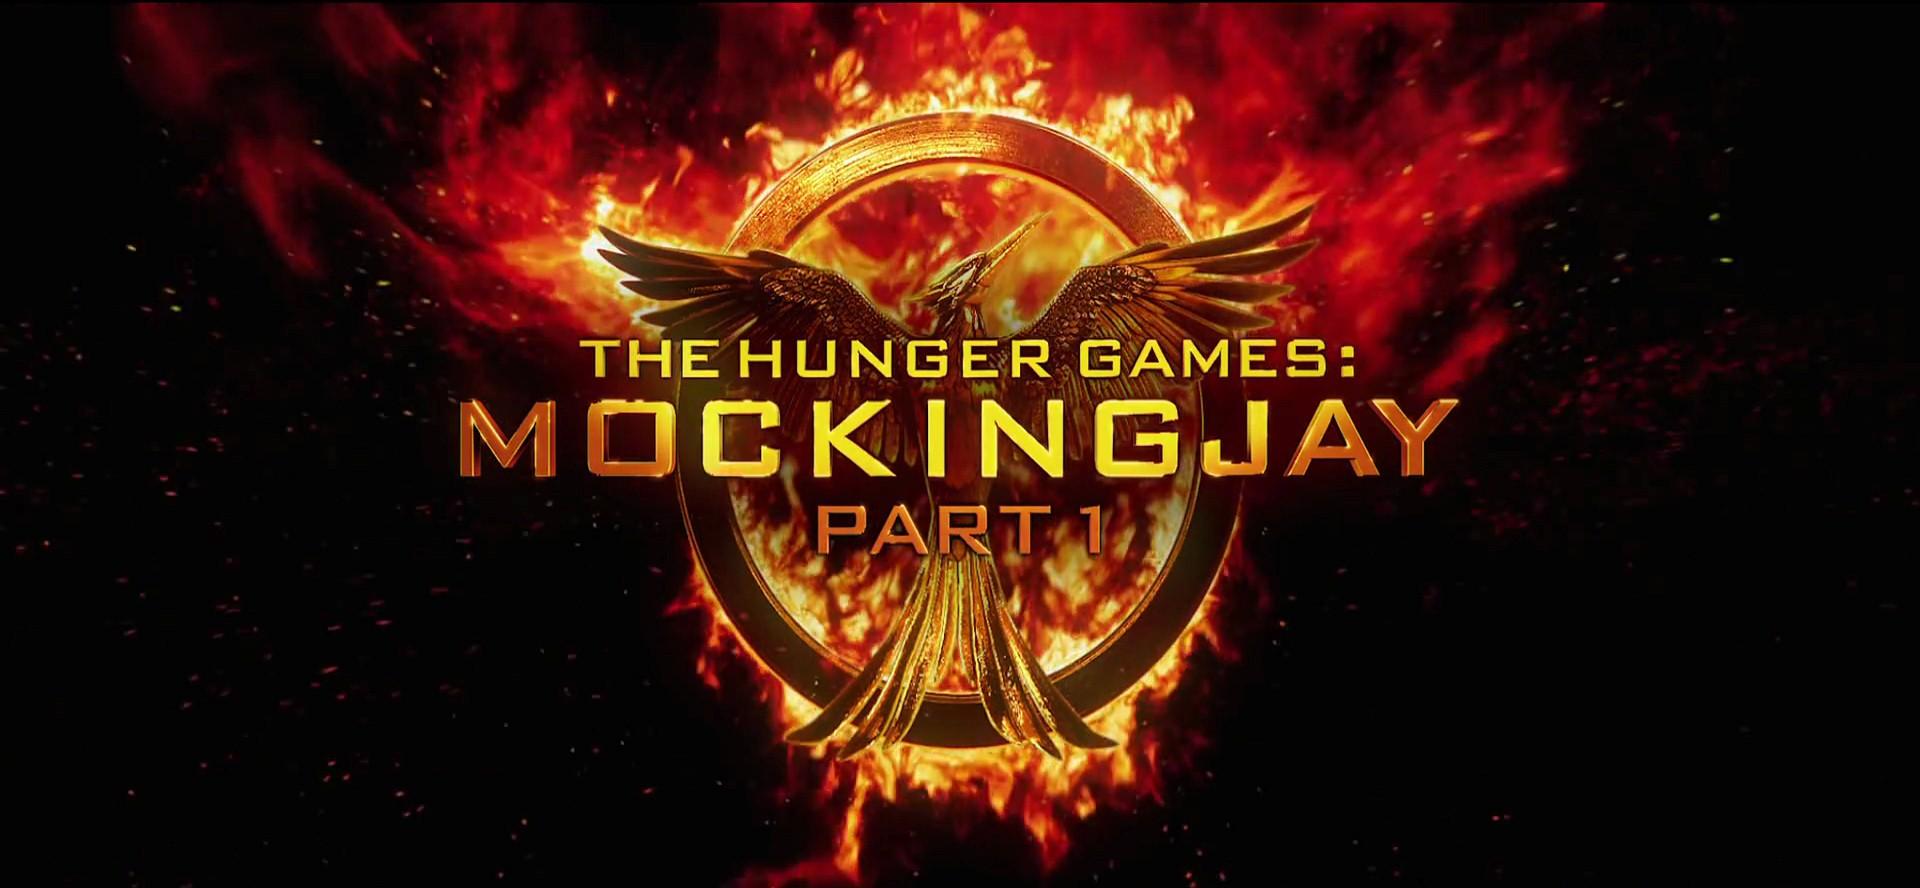 Hunger Games Mockingjay Poster Wallpaper 12359 Wallpaper Wallpaper 1920x888